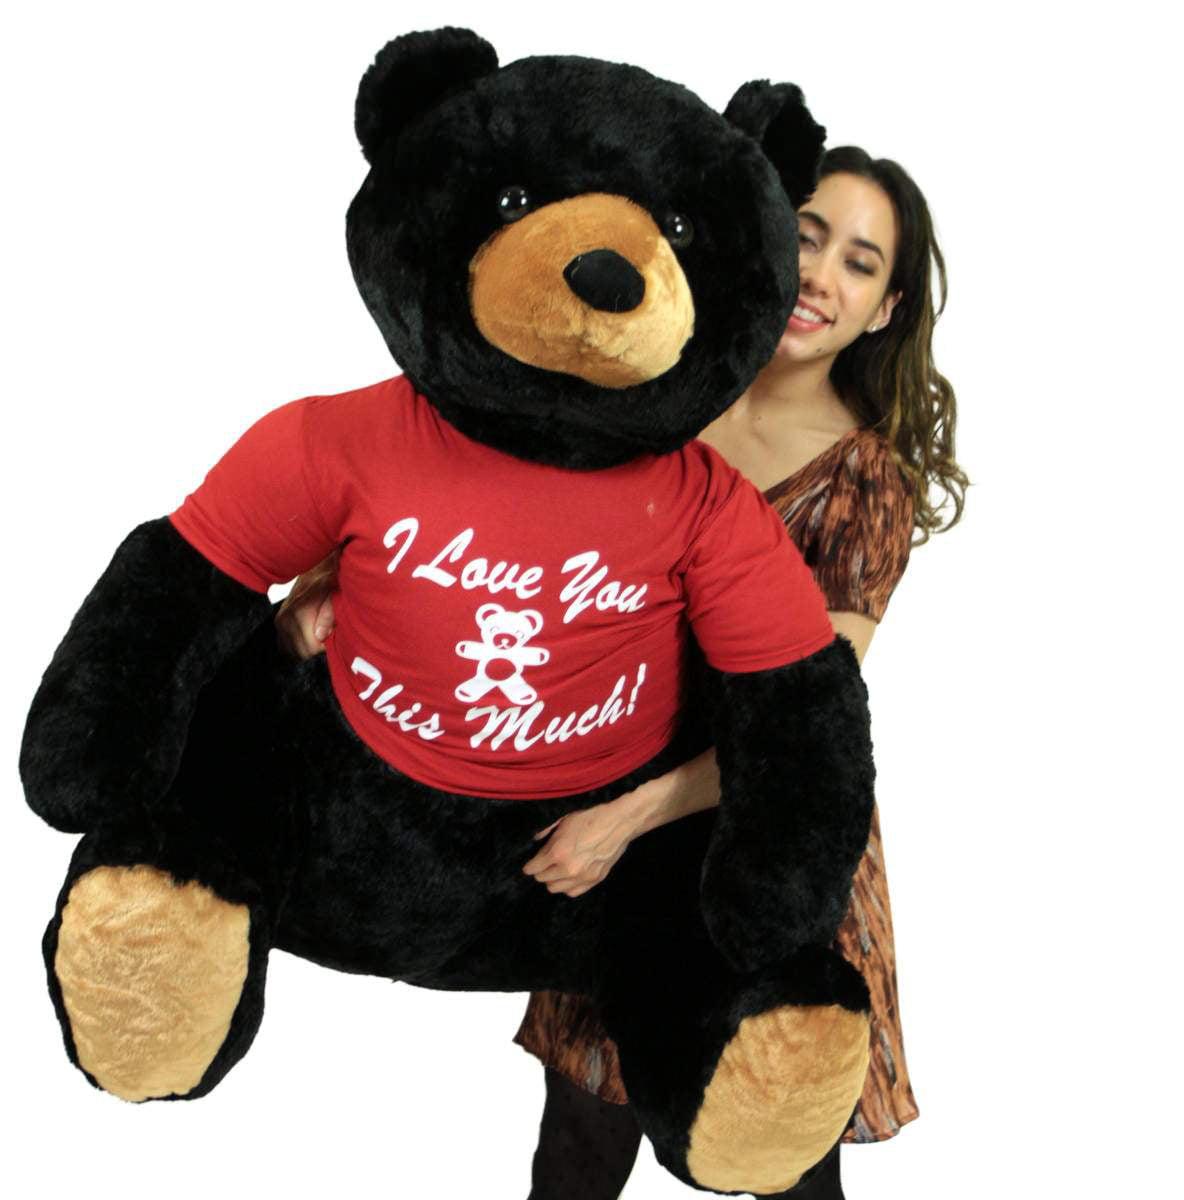 Romantic Life Size Black Teddy Bear, Soft Big Plush Anima...